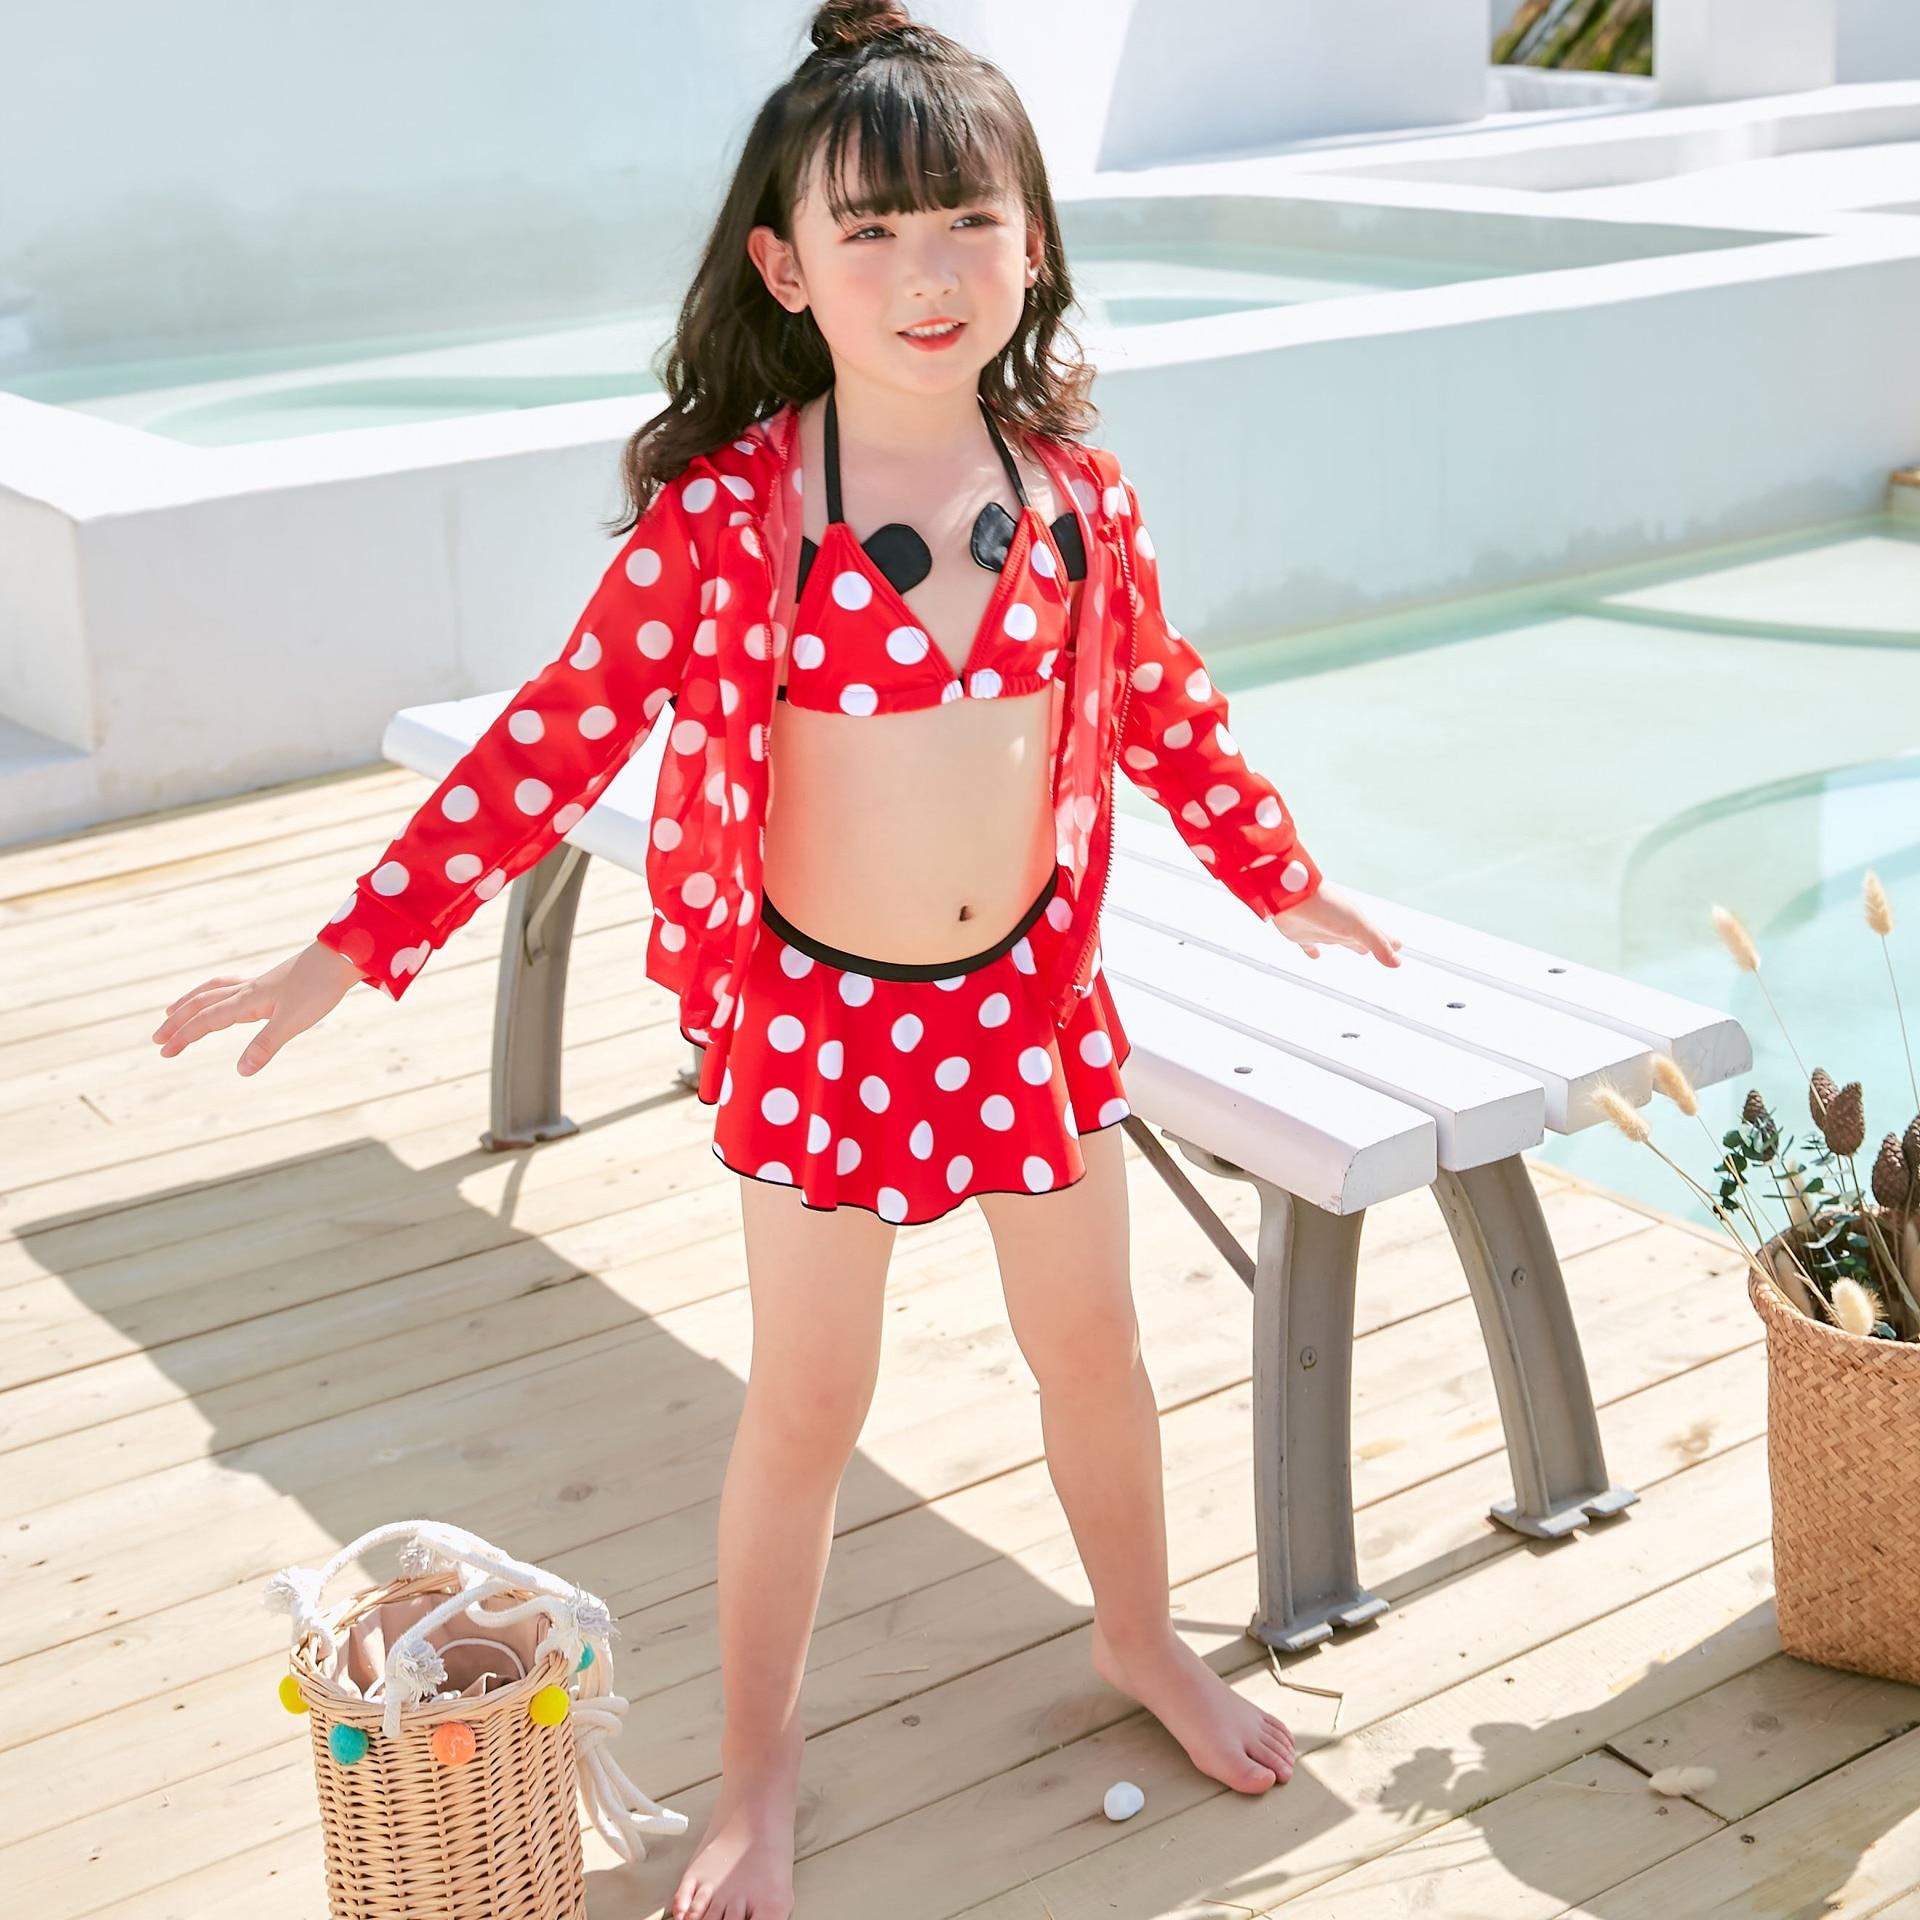 Dai Xi Si KID'S Swimwear Women's Small CHILDREN'S Cartoon Mickey Mouse Split Type Bikini Three-piece Set KID'S Swimwear 9629